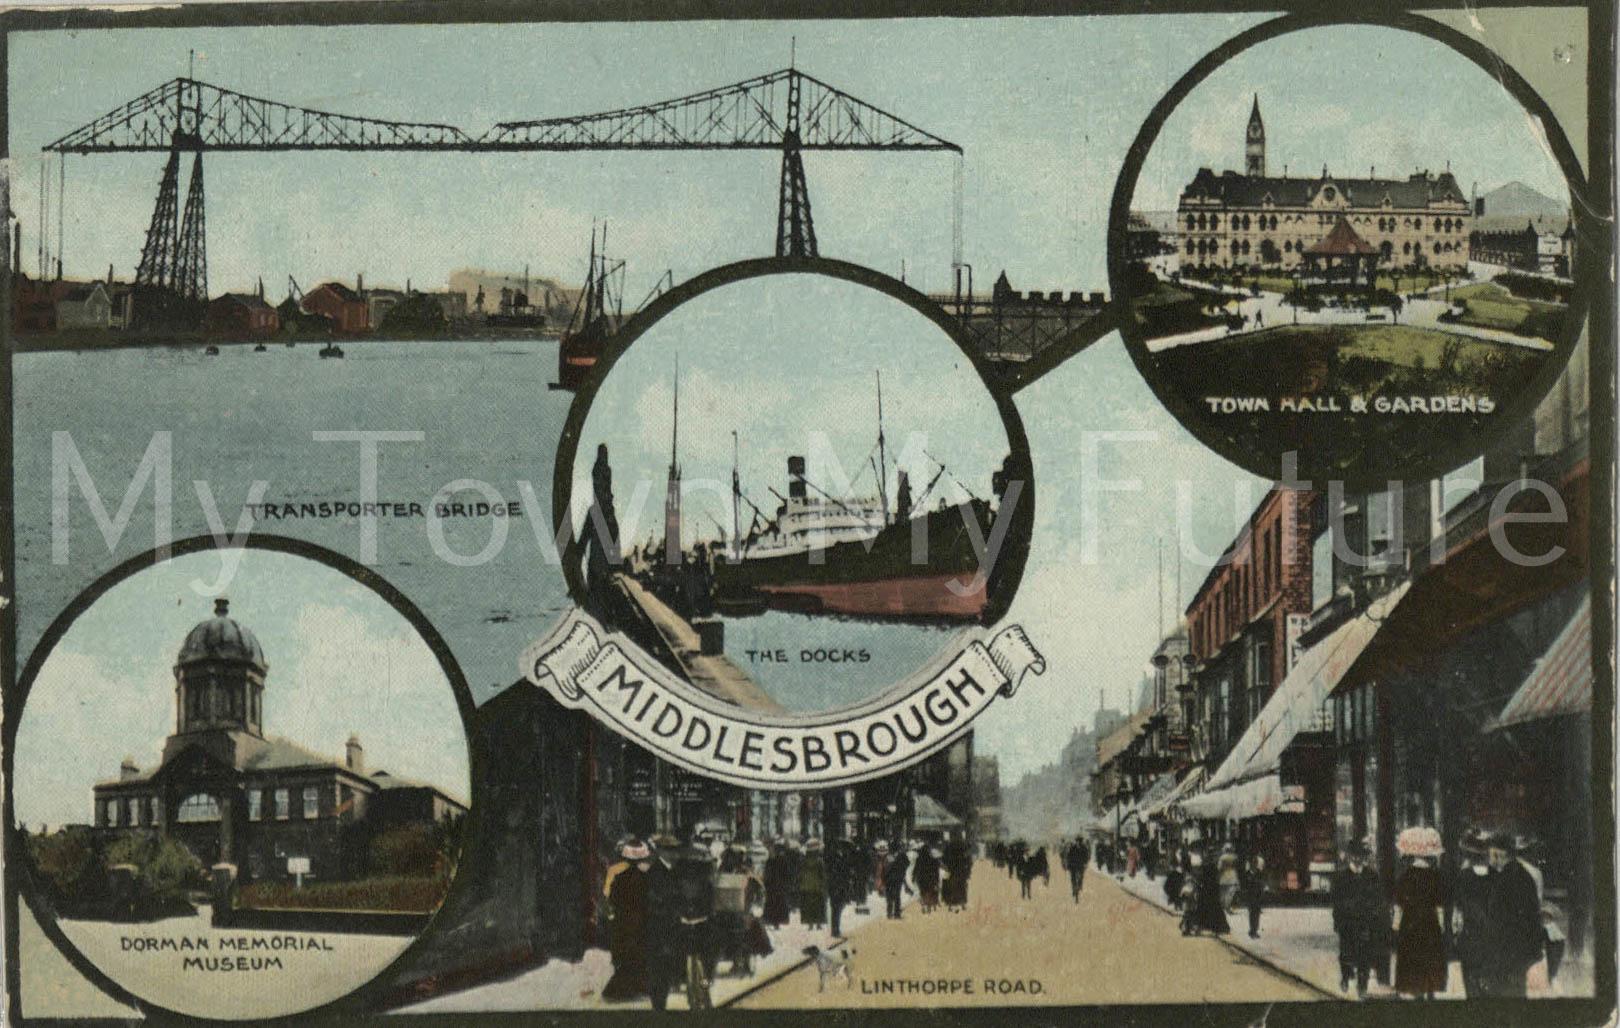 Middlesbrough Postcard